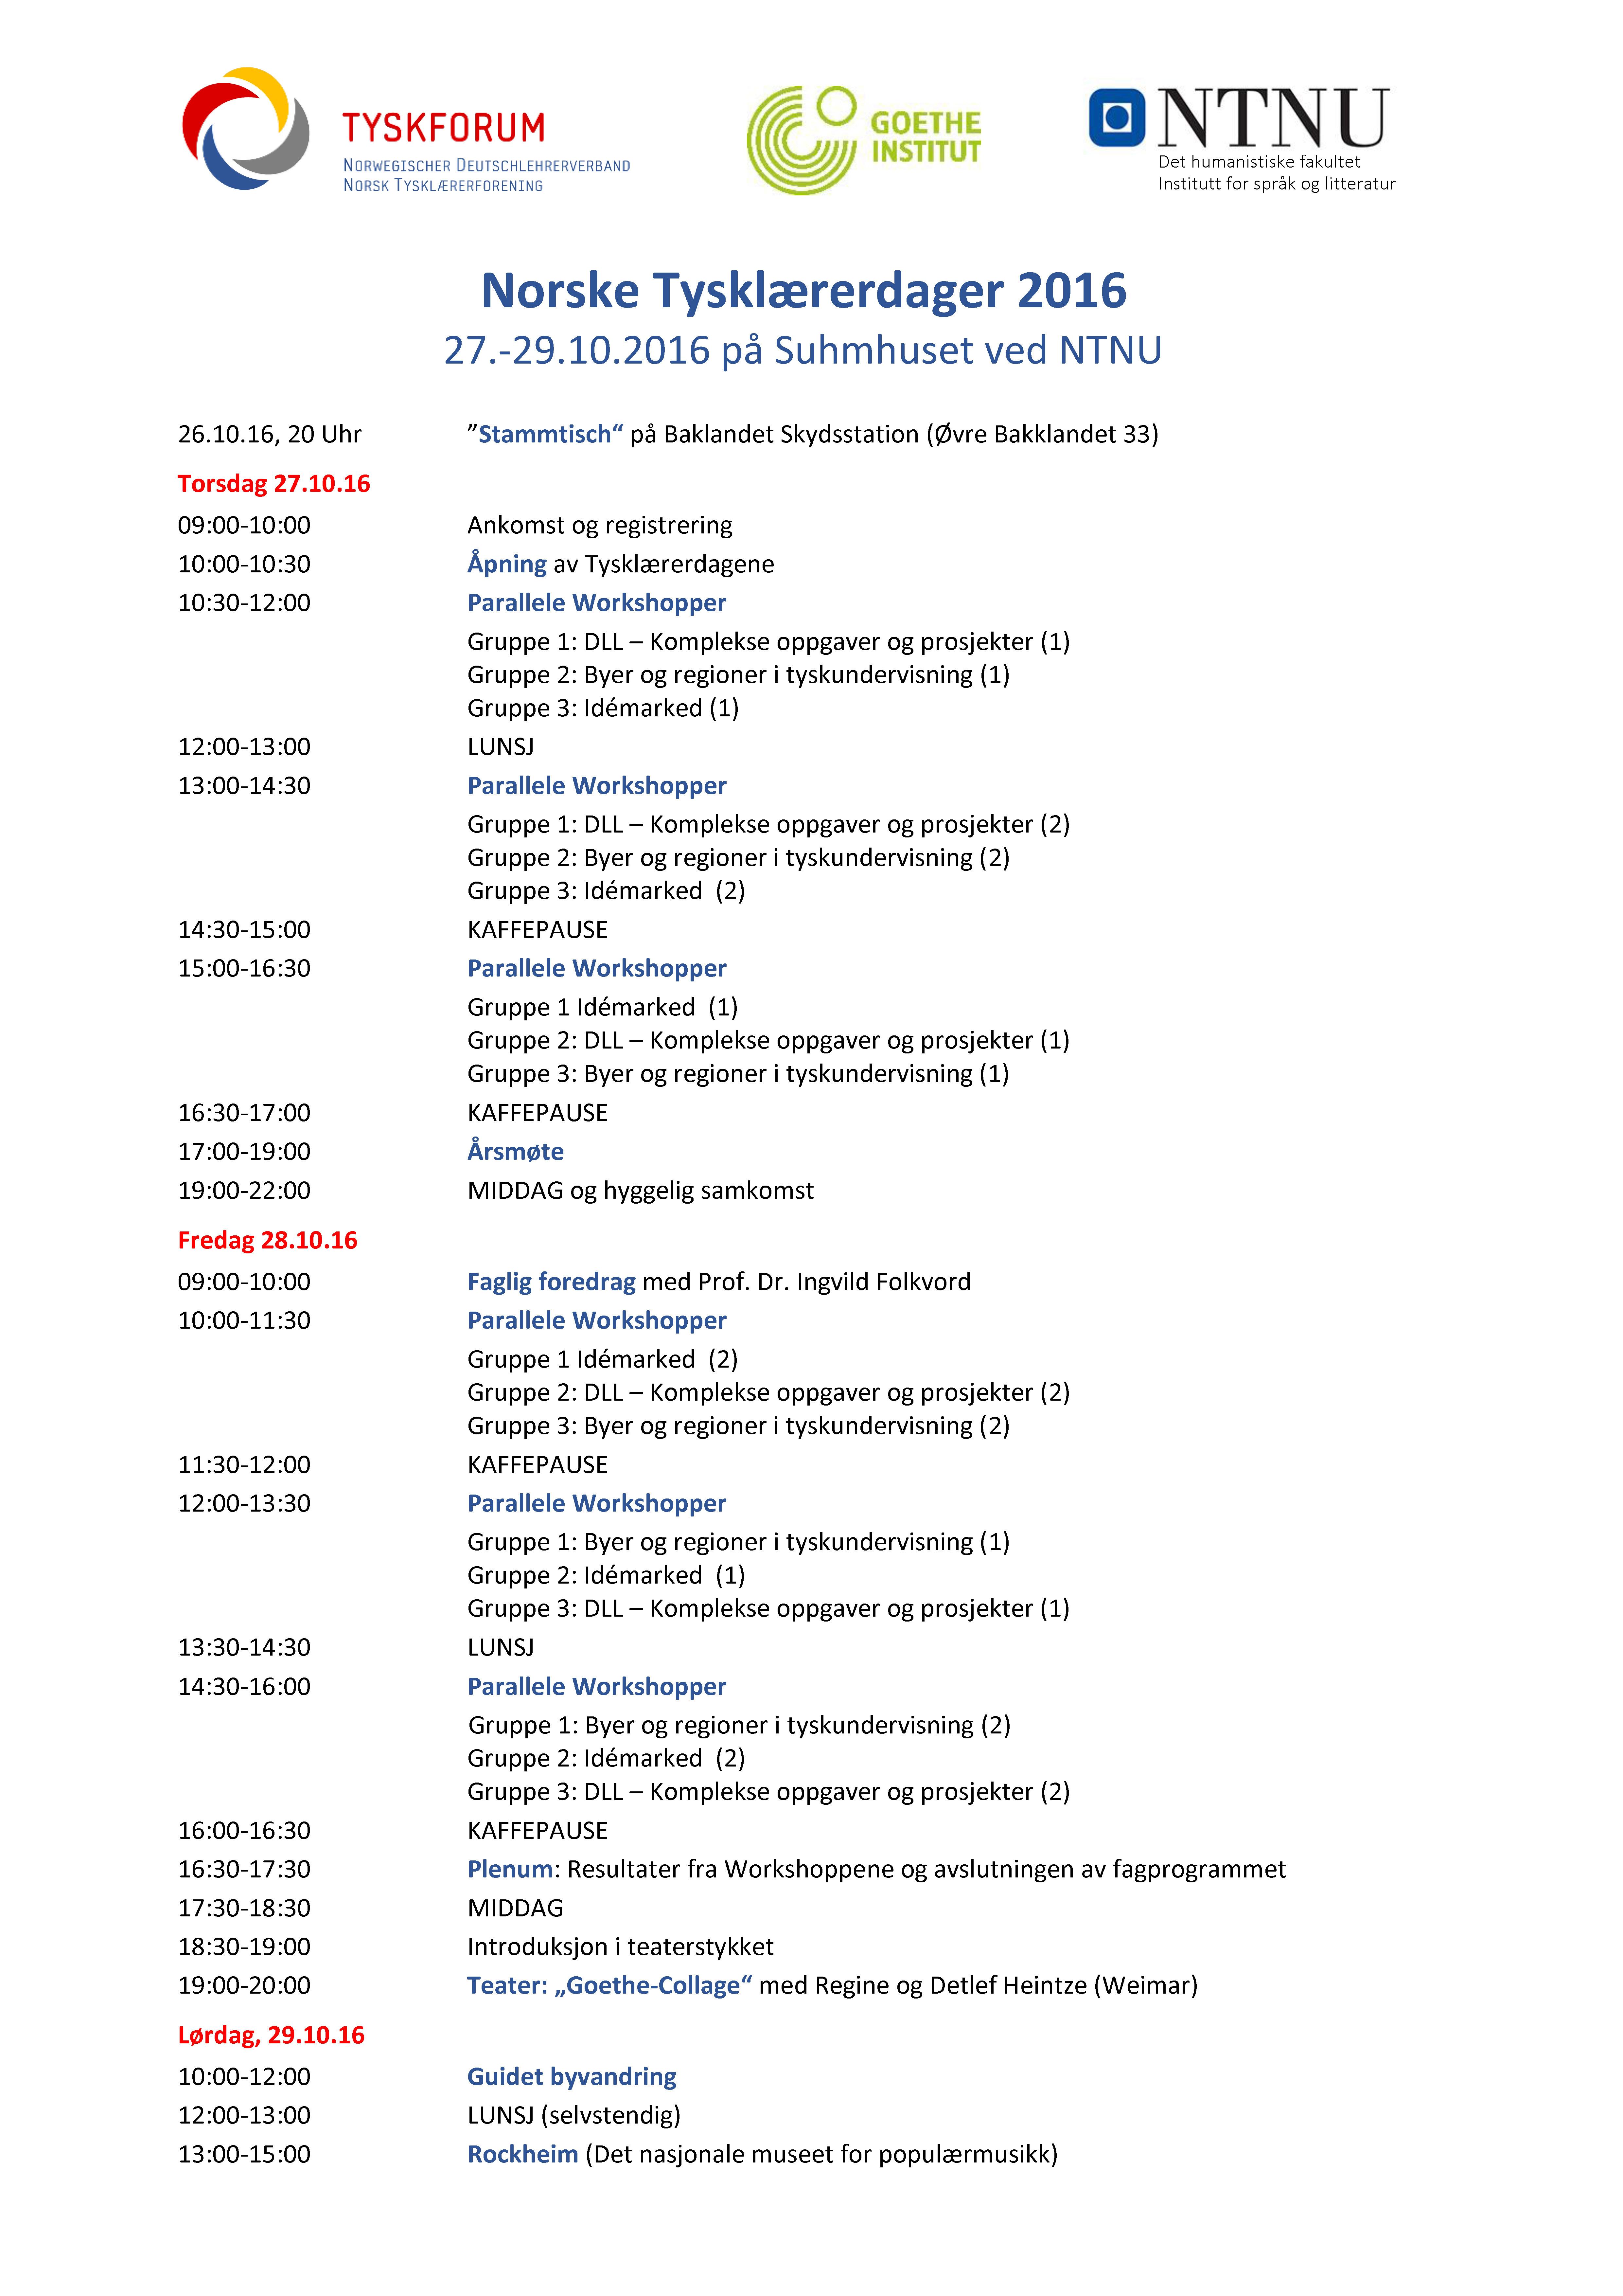 NDT-2016-Programm-270816-nor